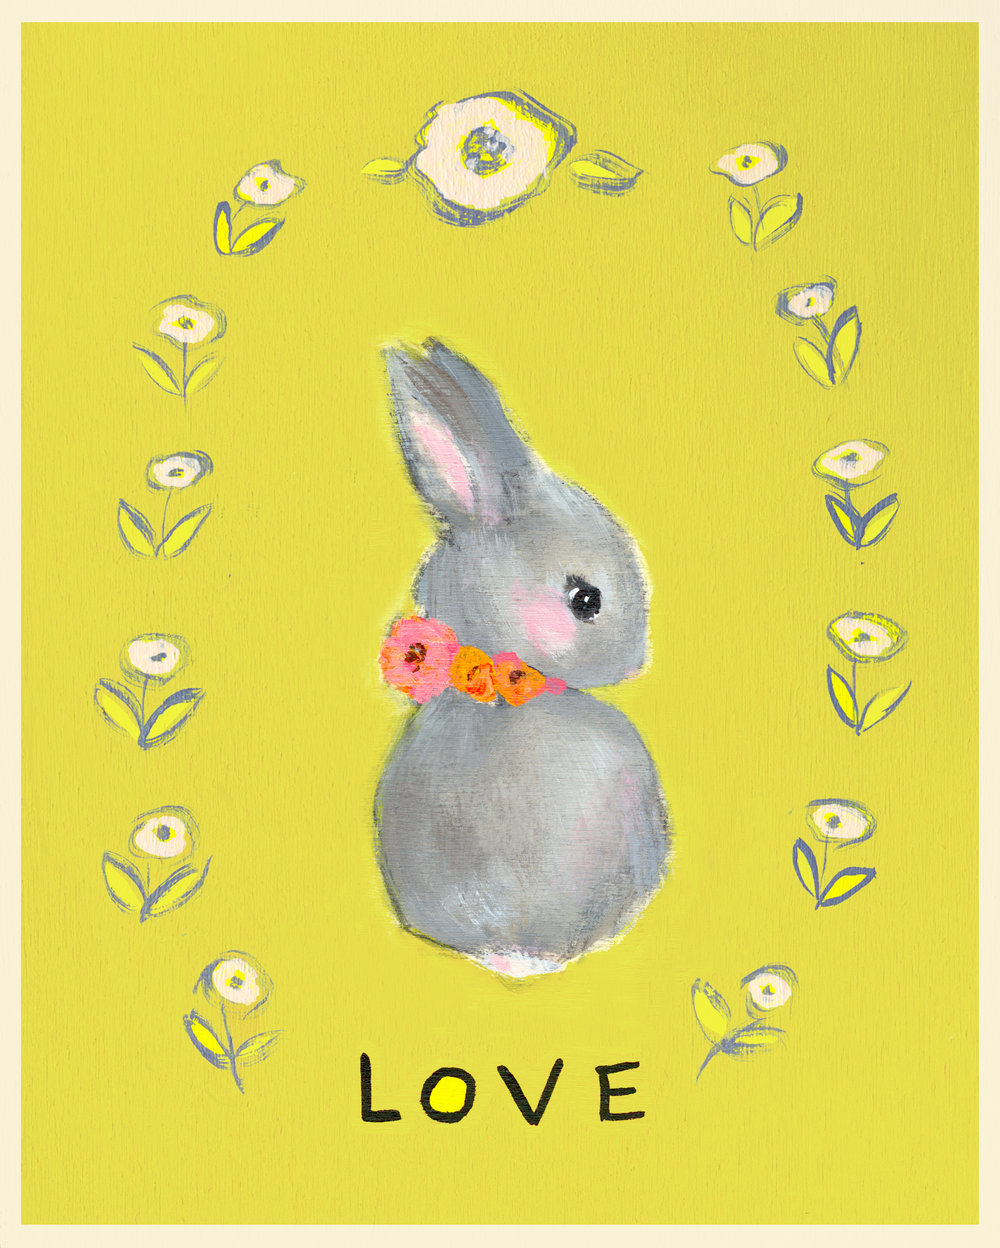 Allyn_Howard_Bunny_love_sm.jpg